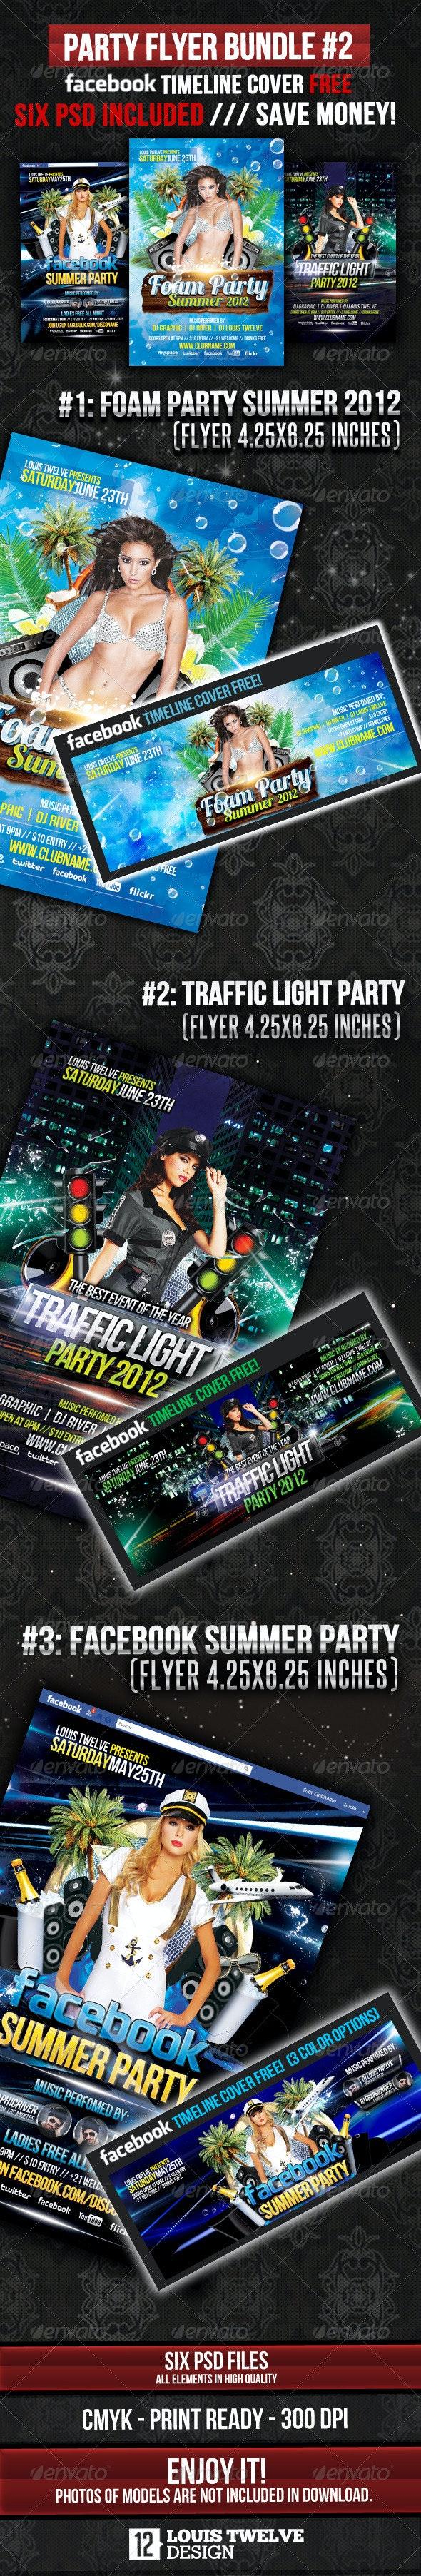 Party Flyer Bundle 02 + Facebook Timeline - Clubs & Parties Events